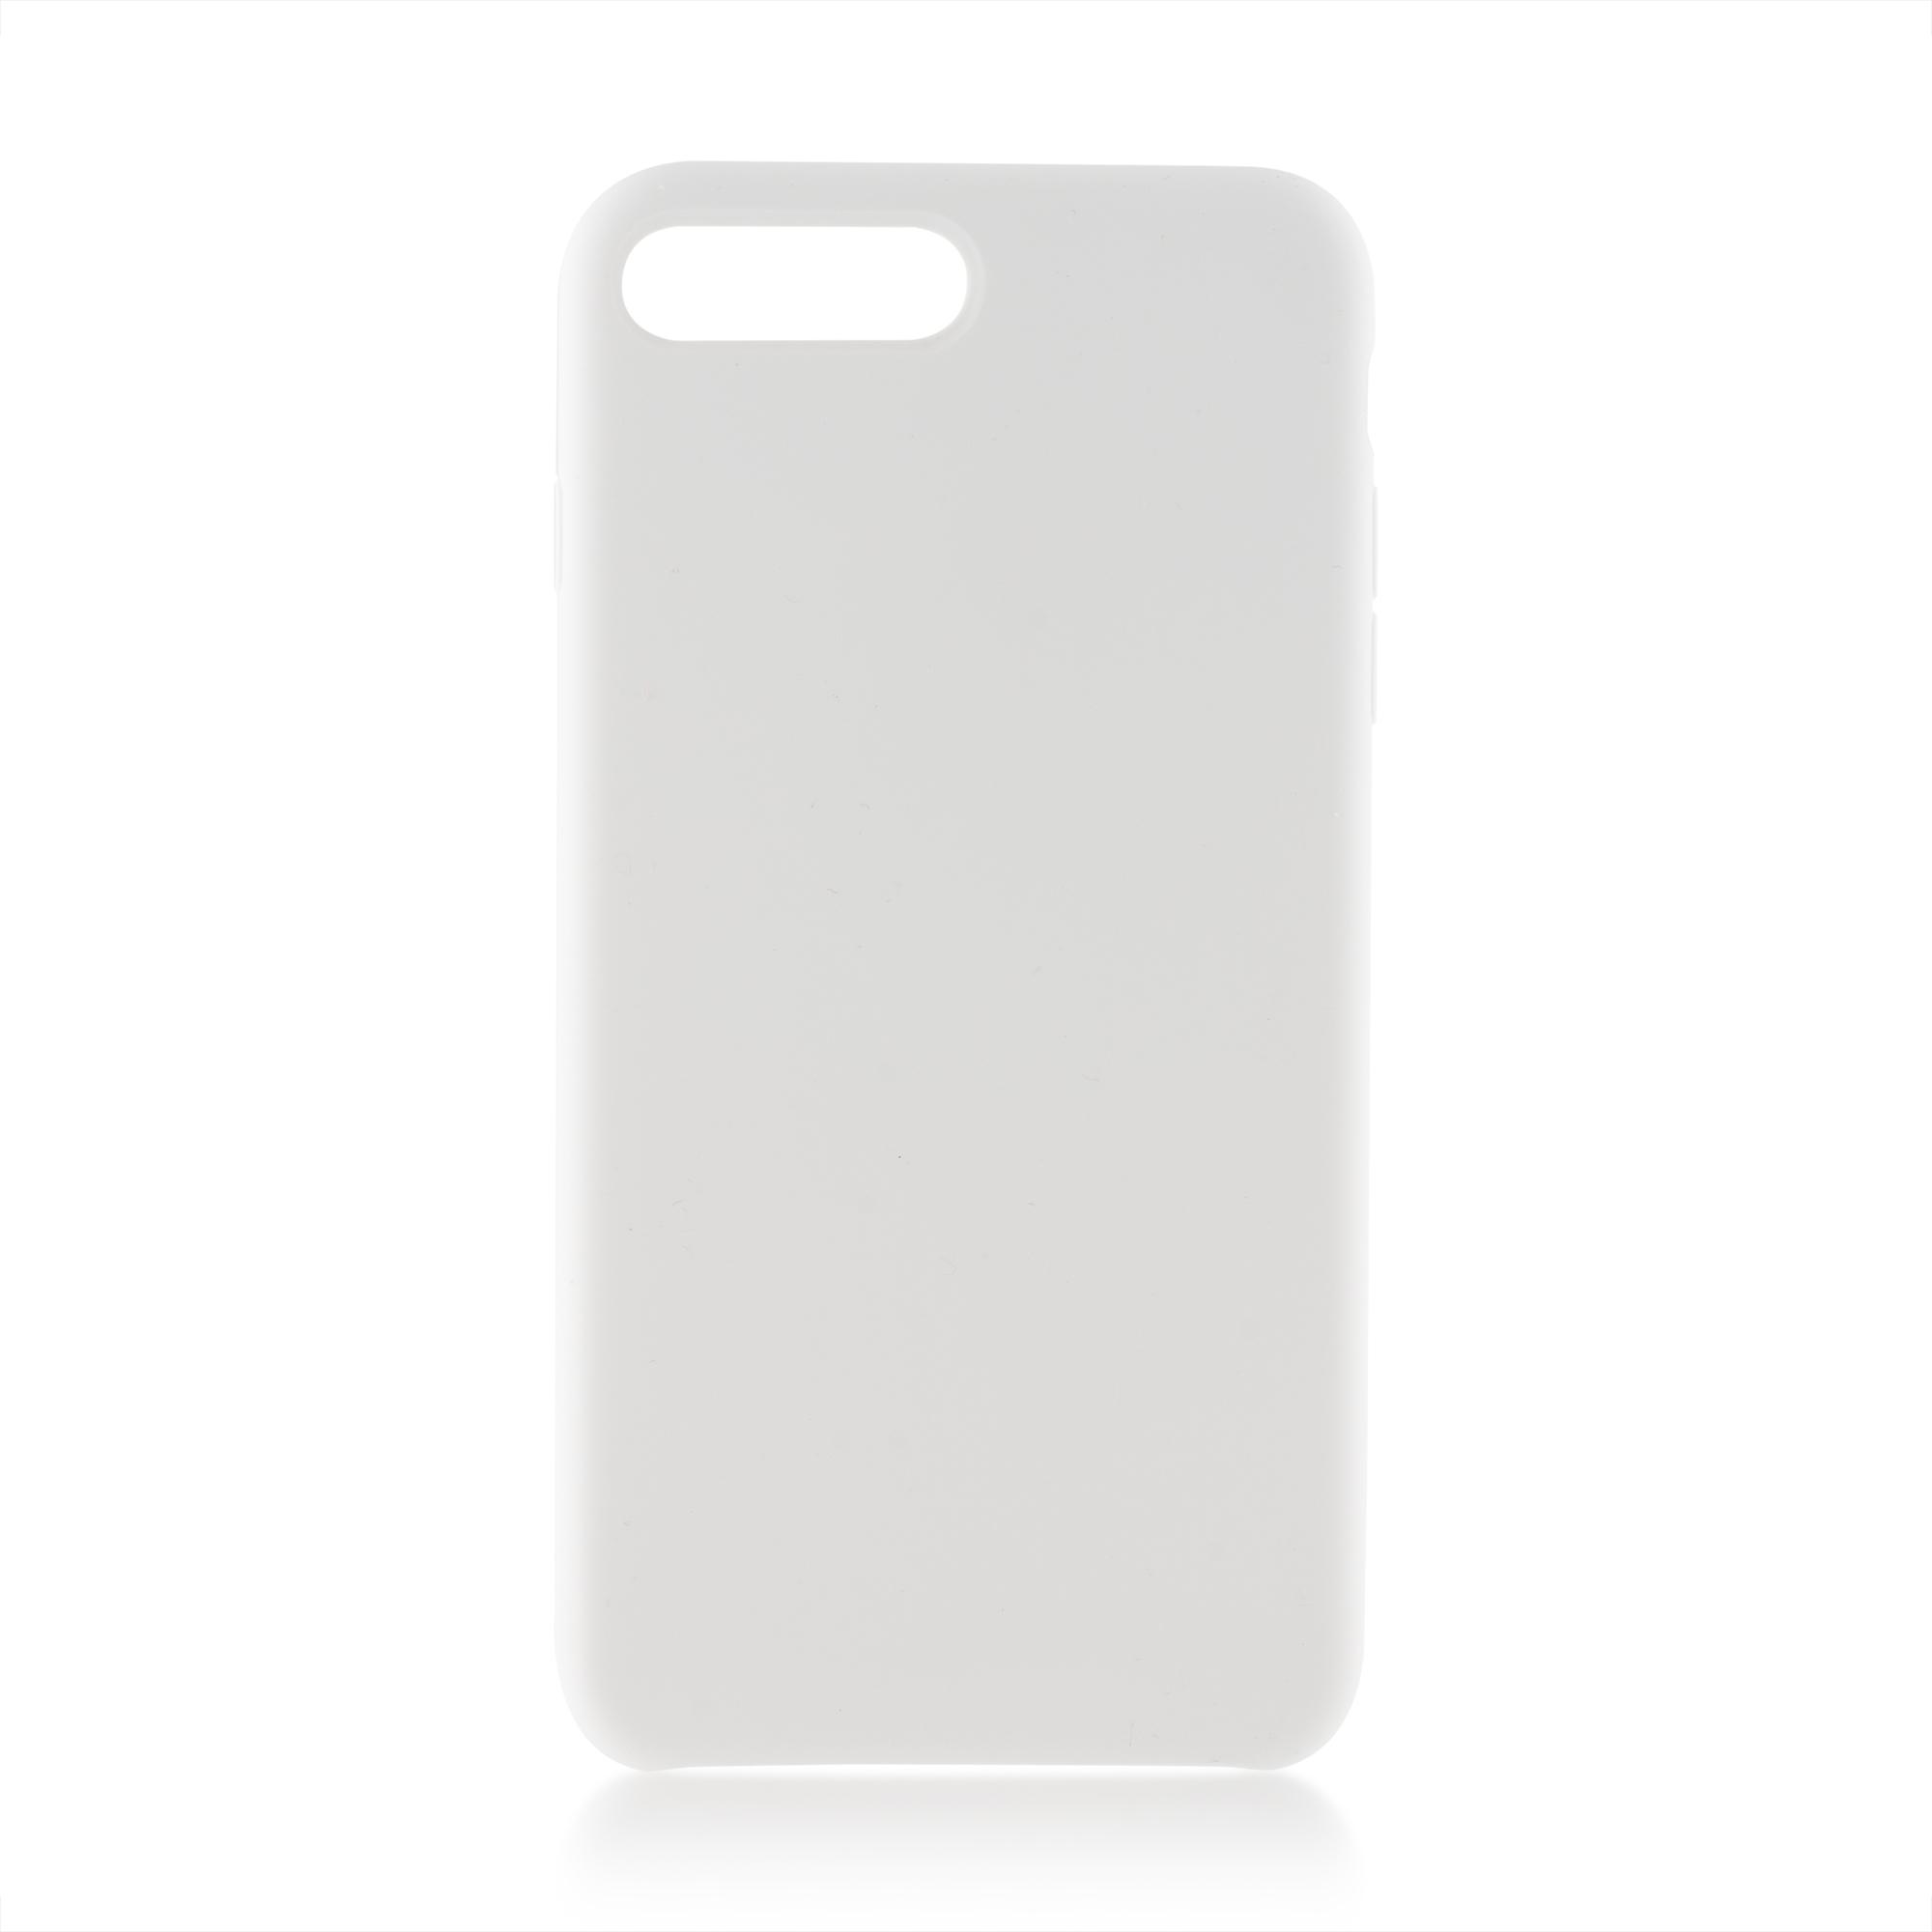 Чехол Brosco Softrubber для Apple iPhone 8 Plus, белый аксессуар чехол для apple iphone 6 brosco soft rubber black ip6 softrubber black